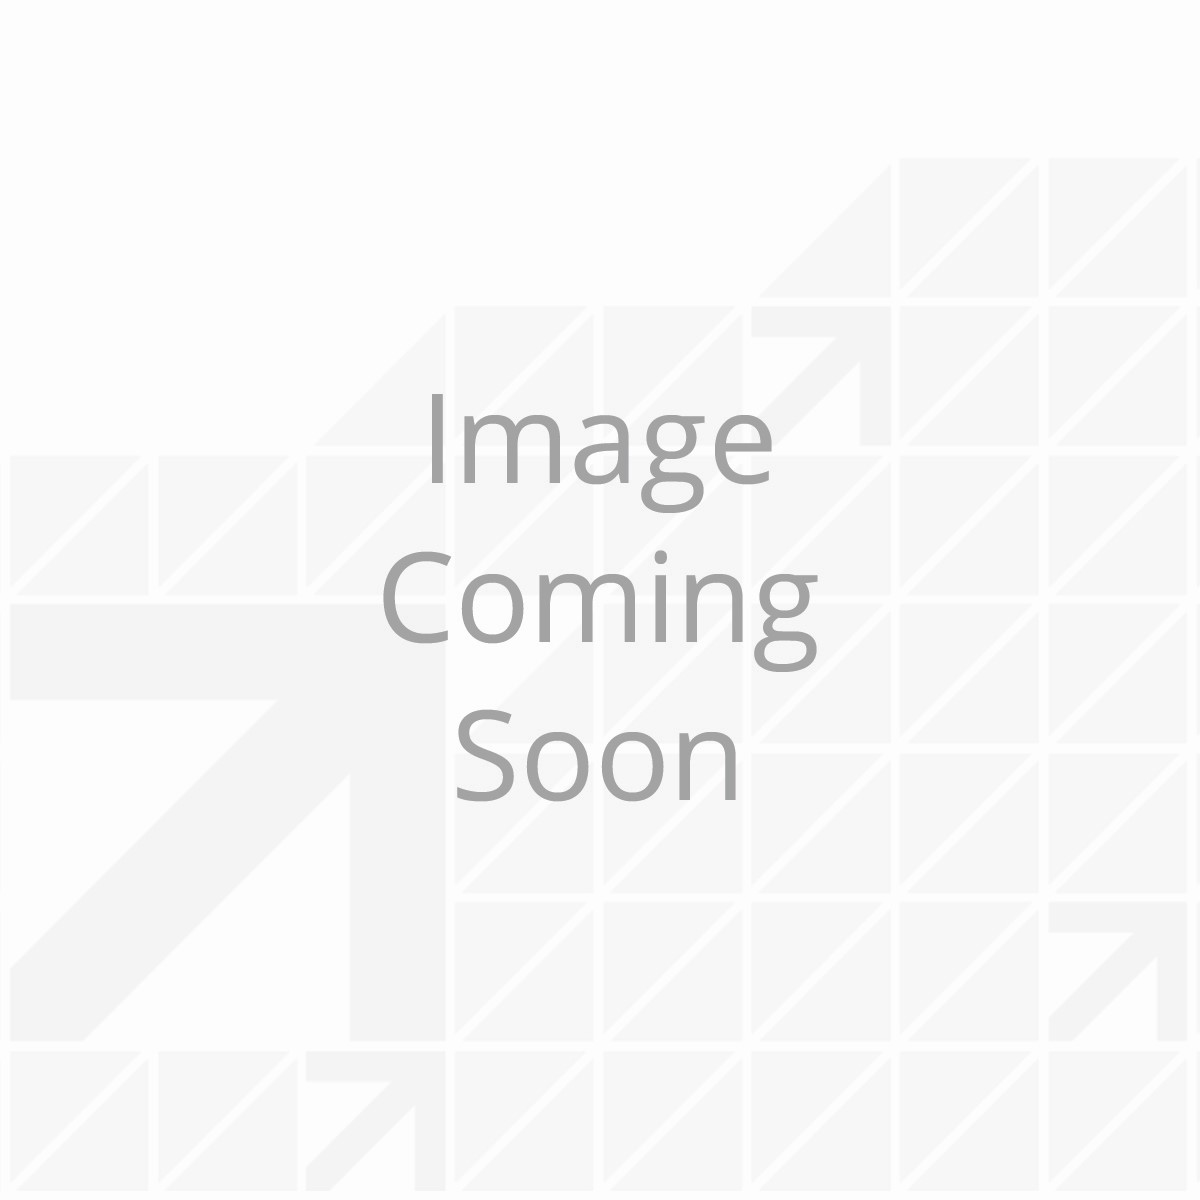 689052_Water-Pump_001